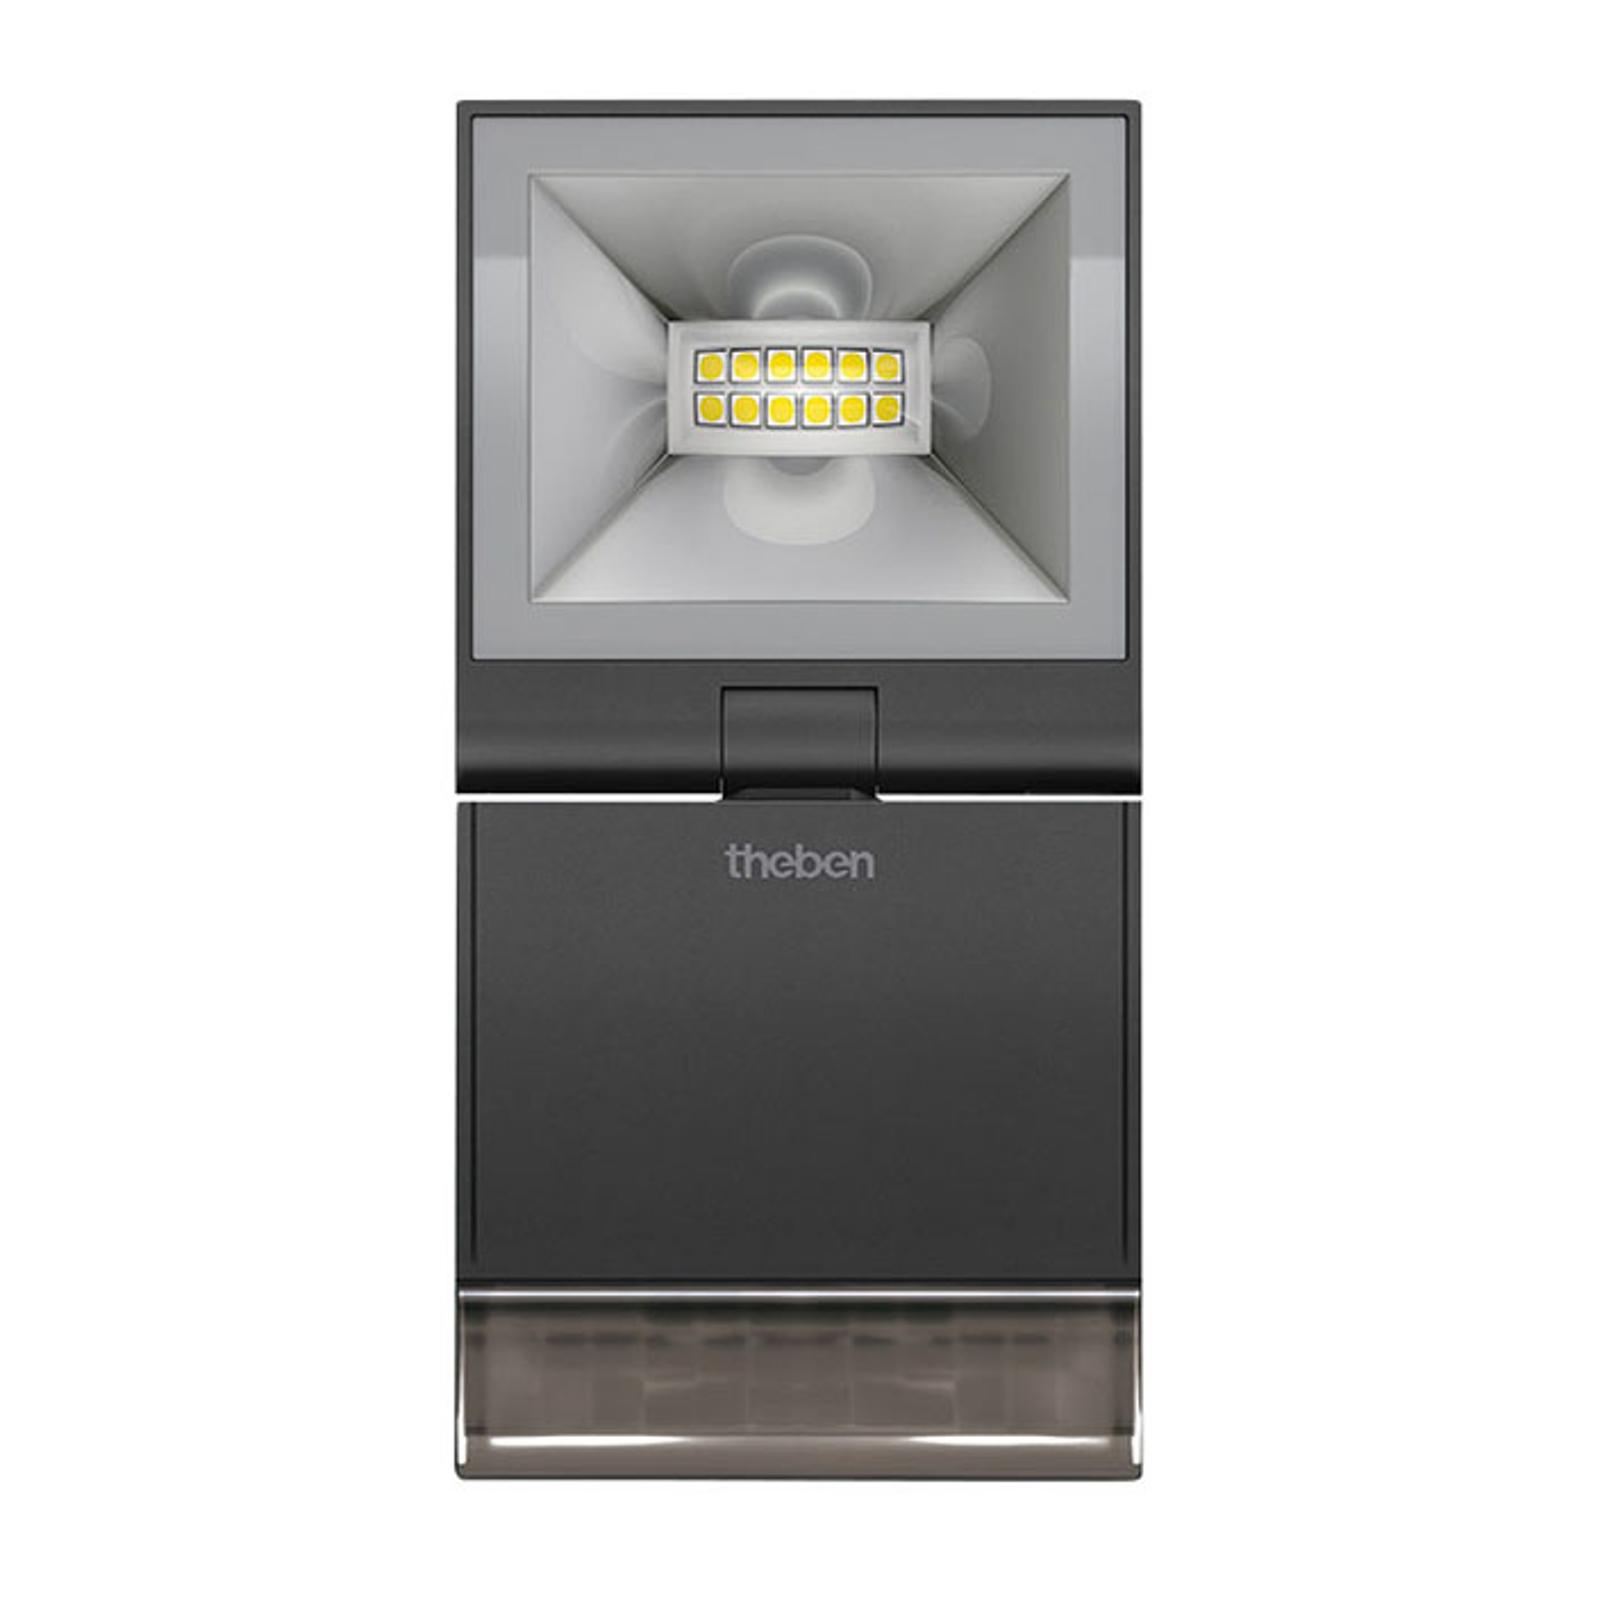 Theben theLeda S10 1 lampe capteur 4000K noir